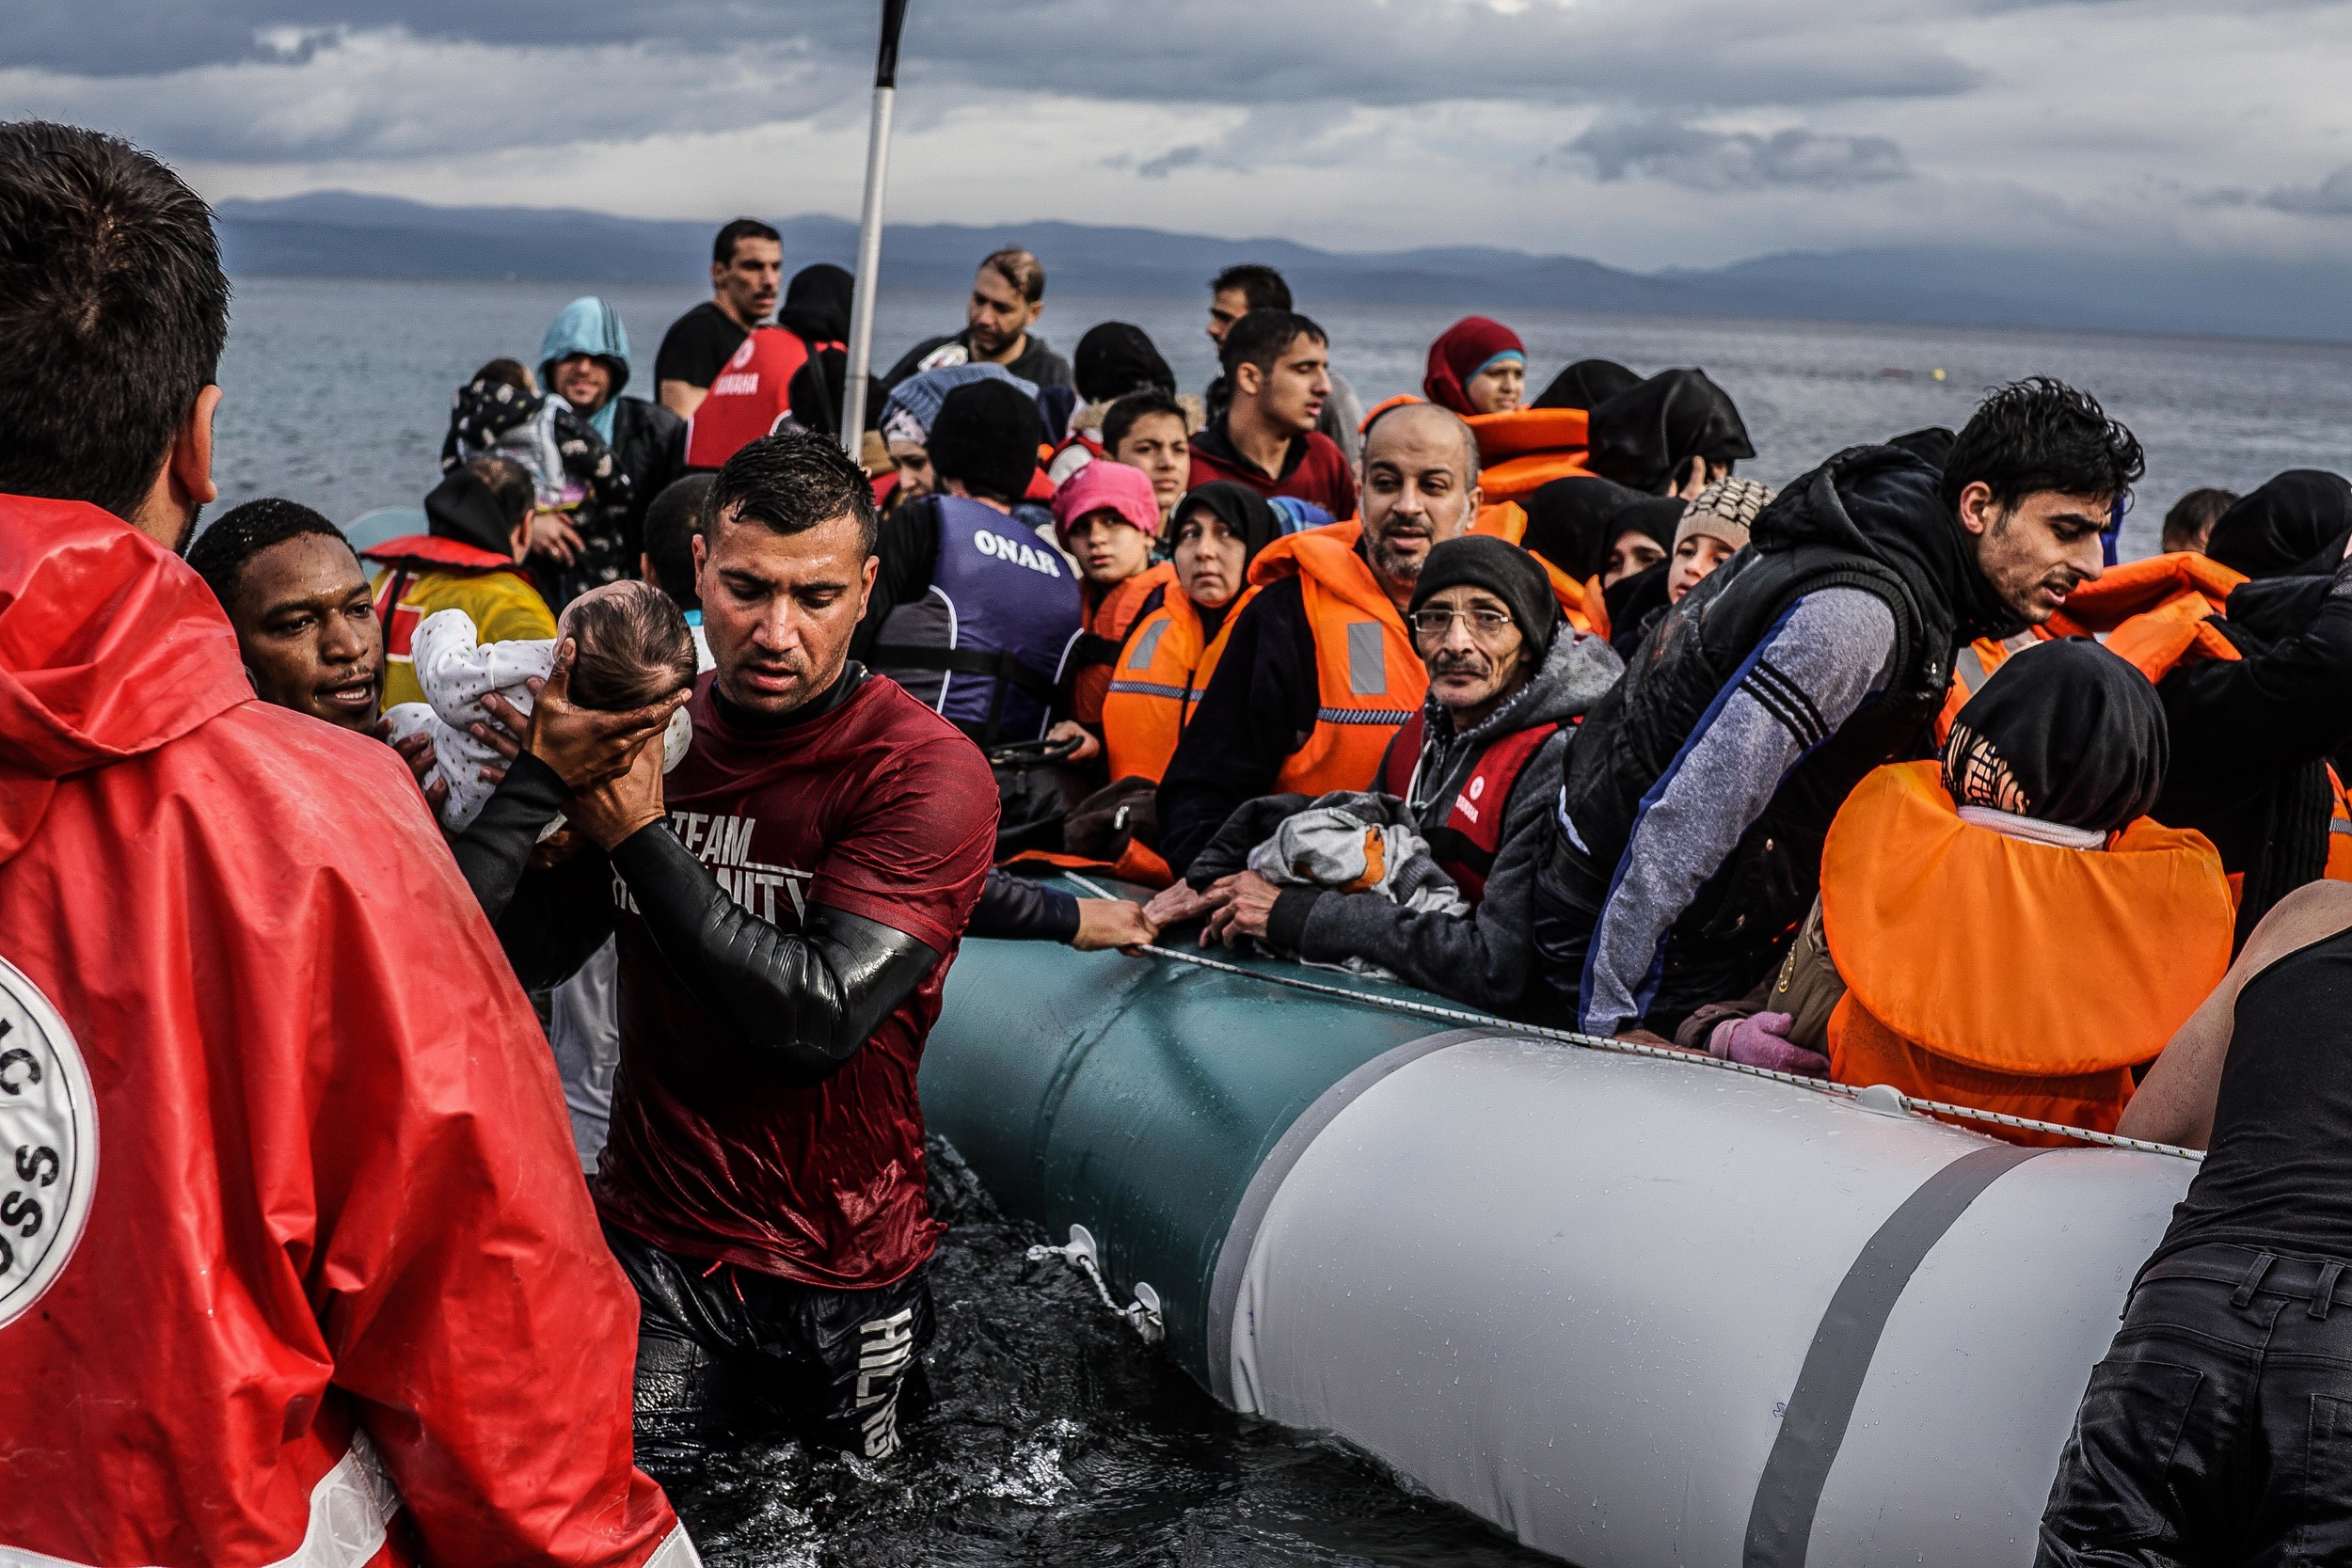 Syrian Refugee Crisis Lesbos Greece November 2015 11.jpg